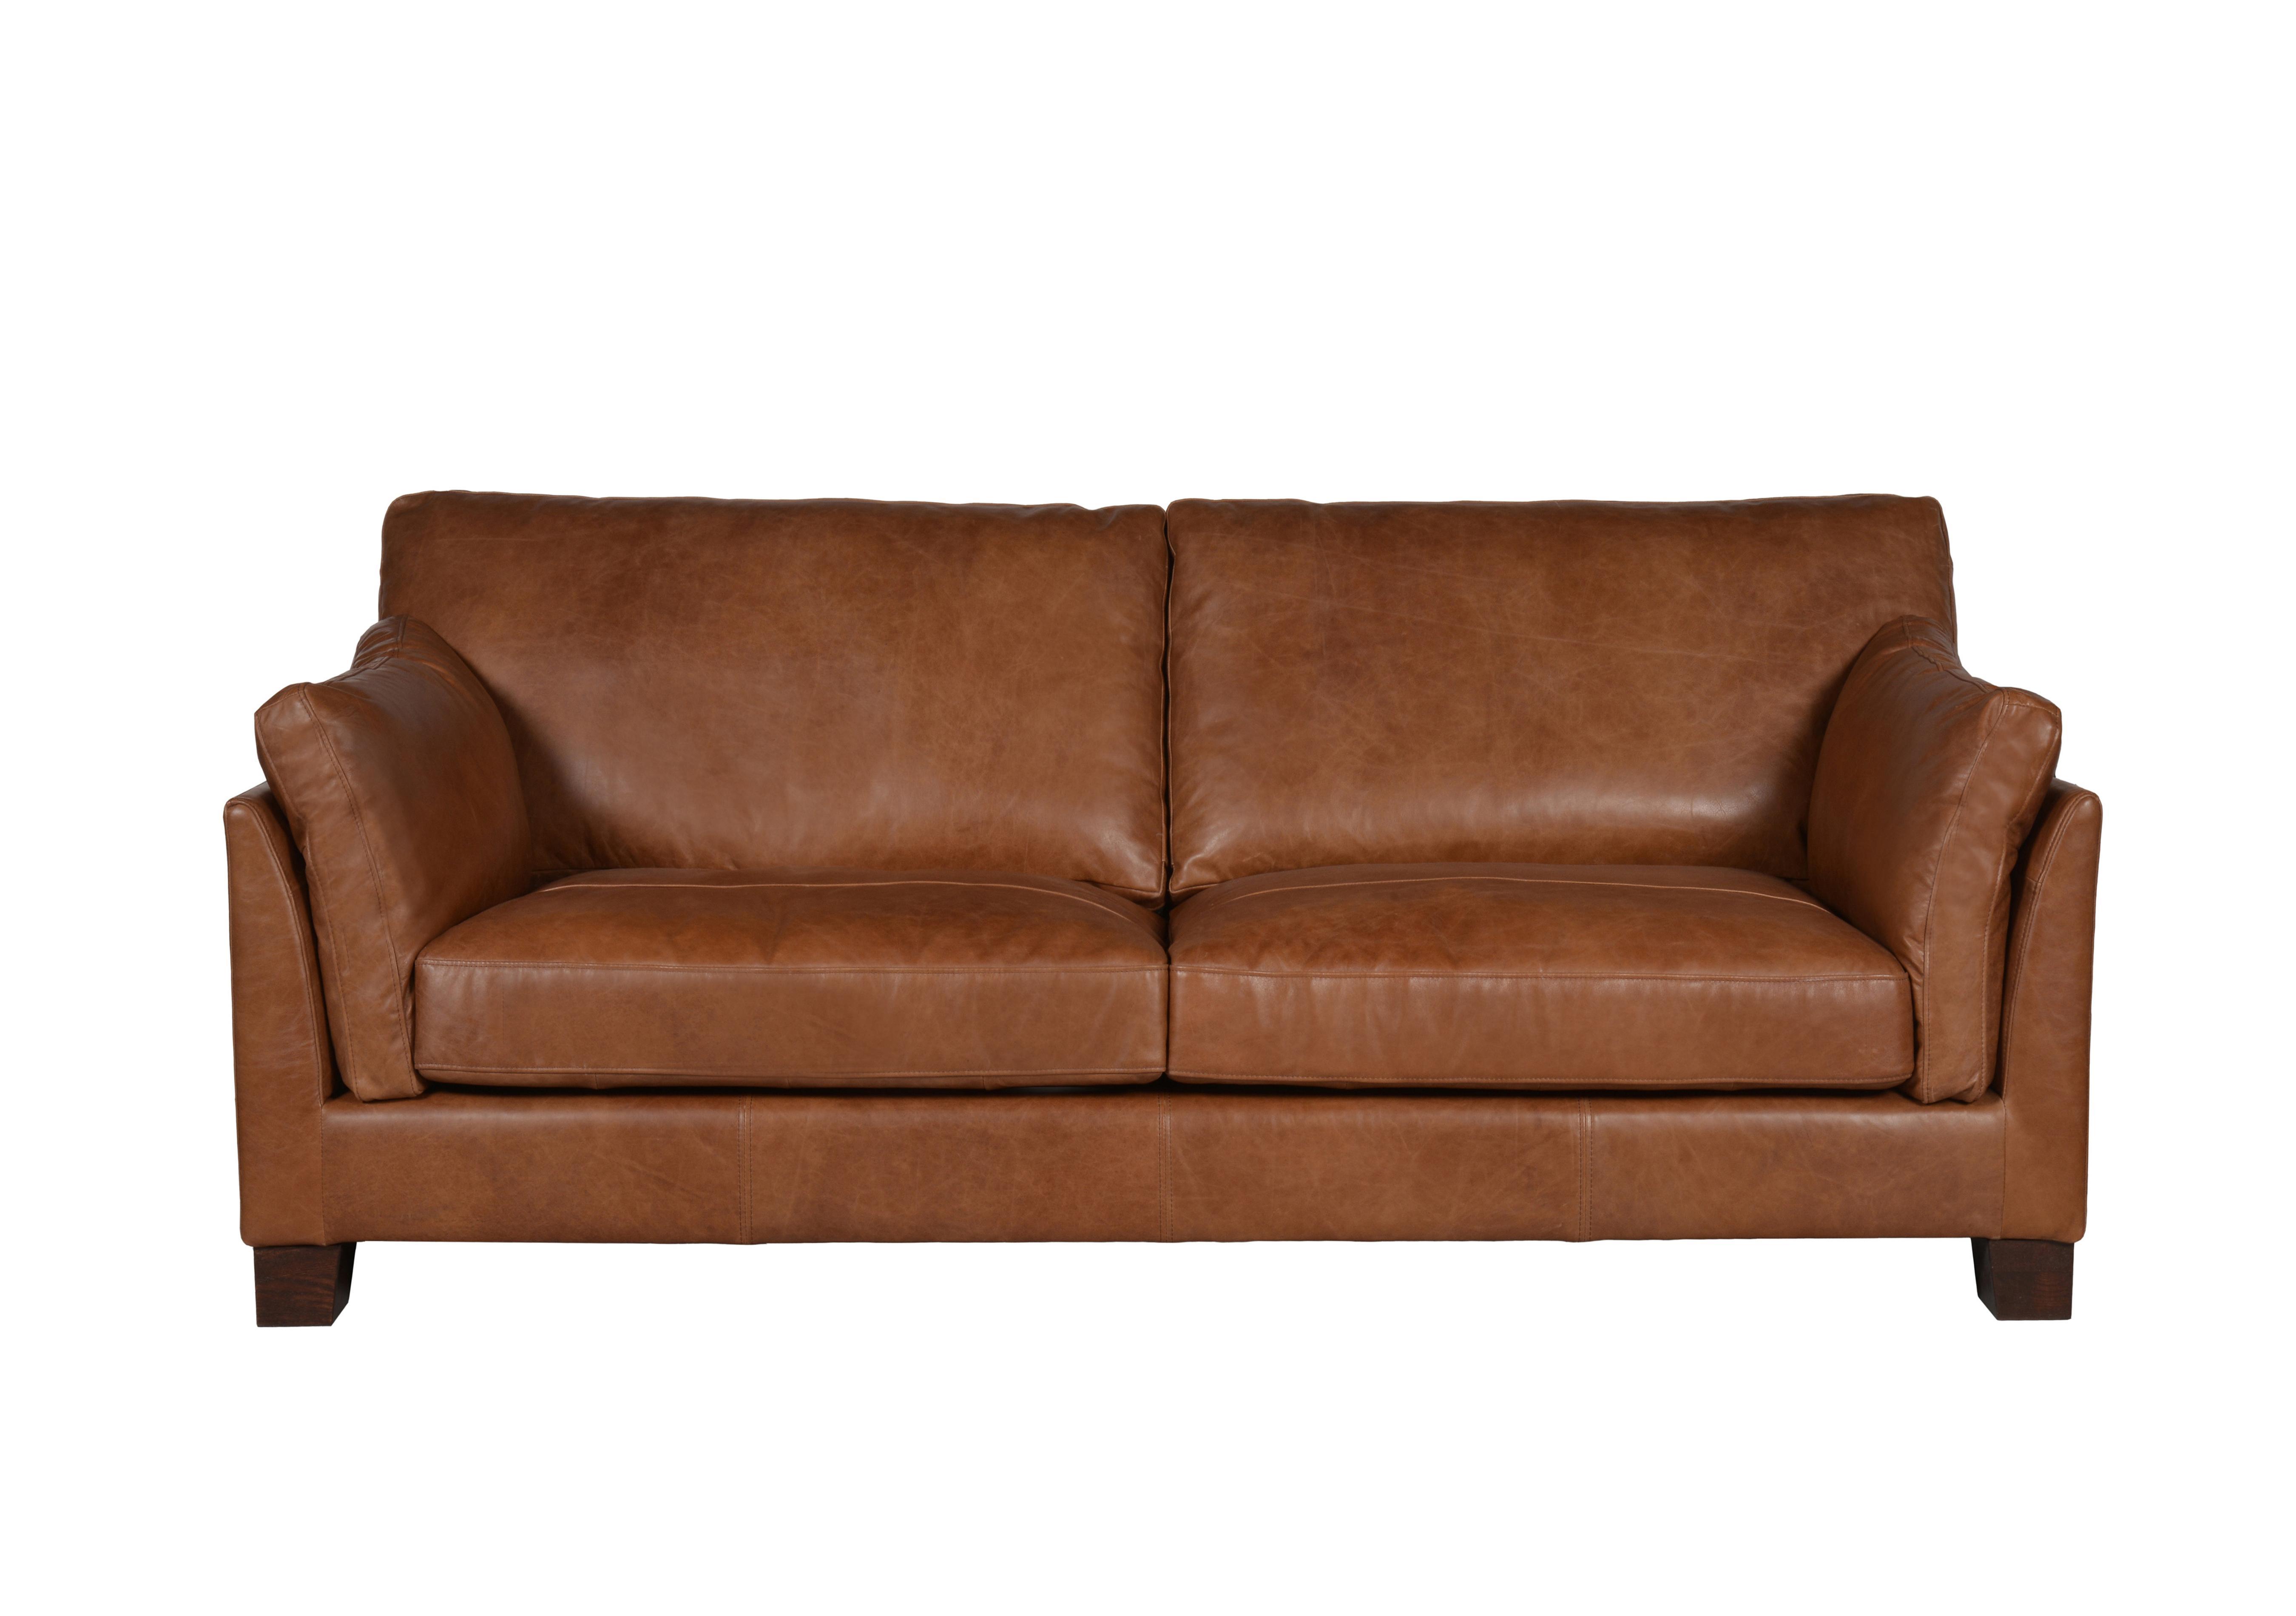 Hillcroft 2 Seater Leather Sofa Halo Furniture Village